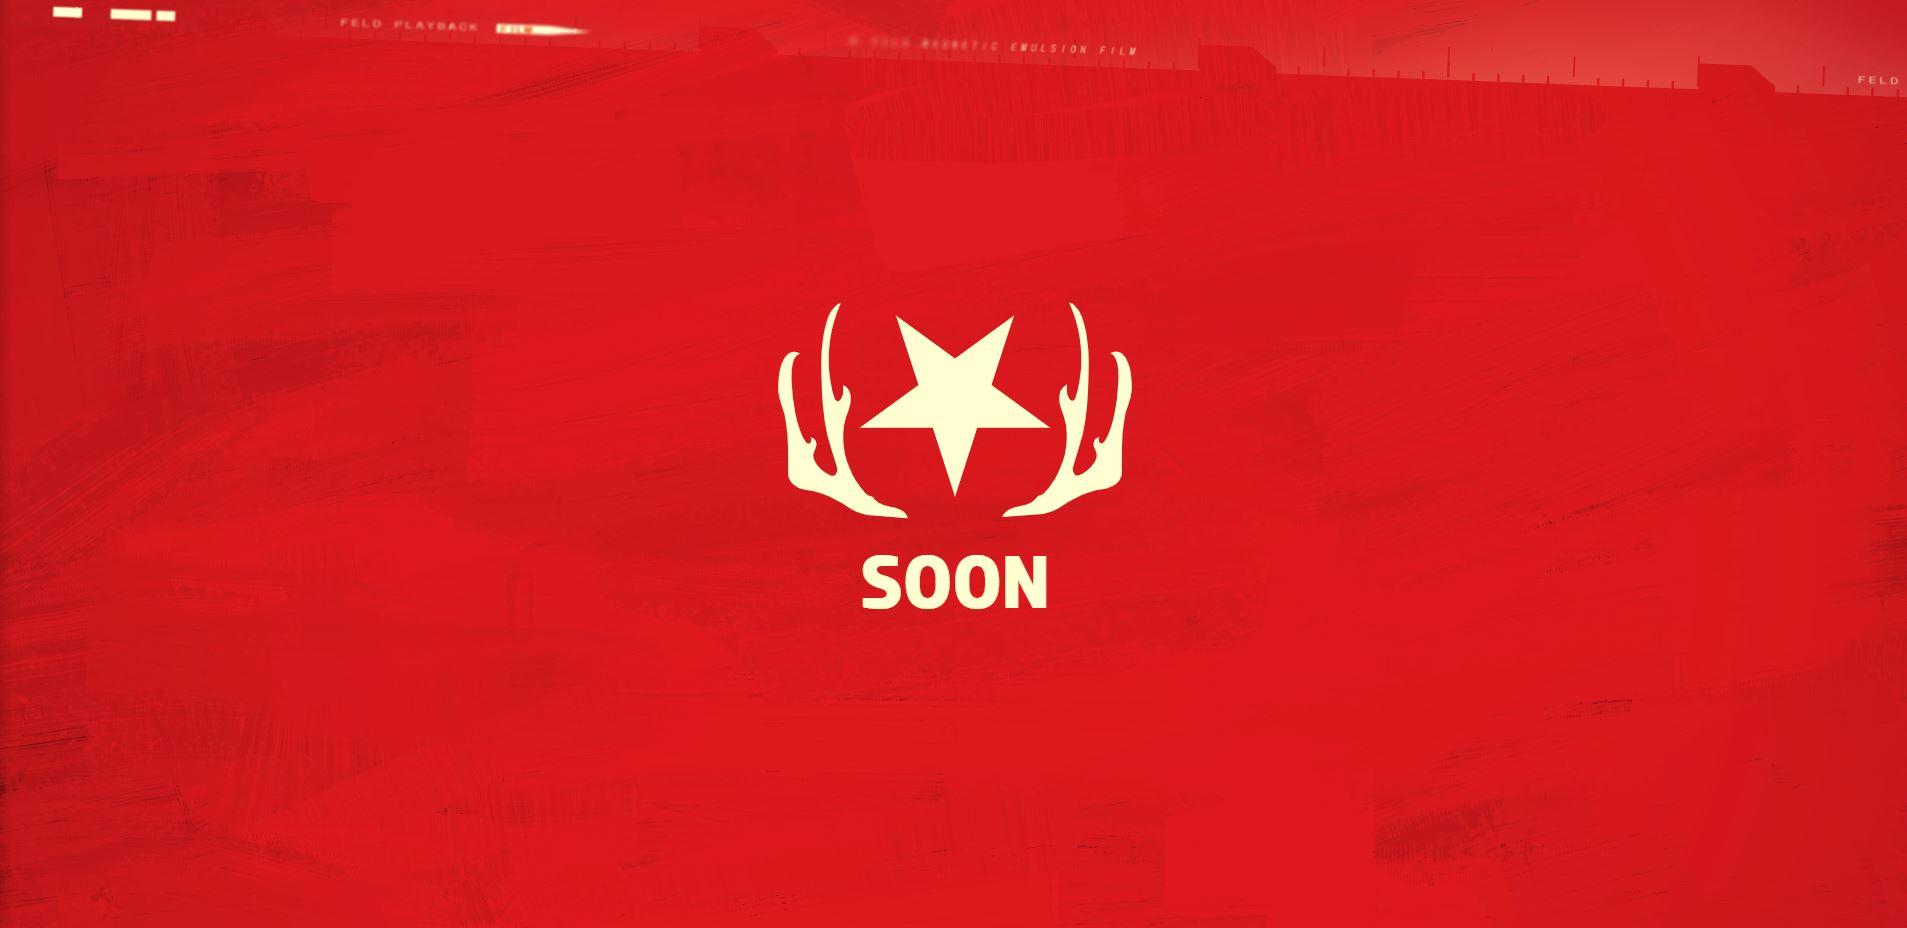 disco-elysium-website-teasing-an-announcement-hopefully-a-console-portrelease-date